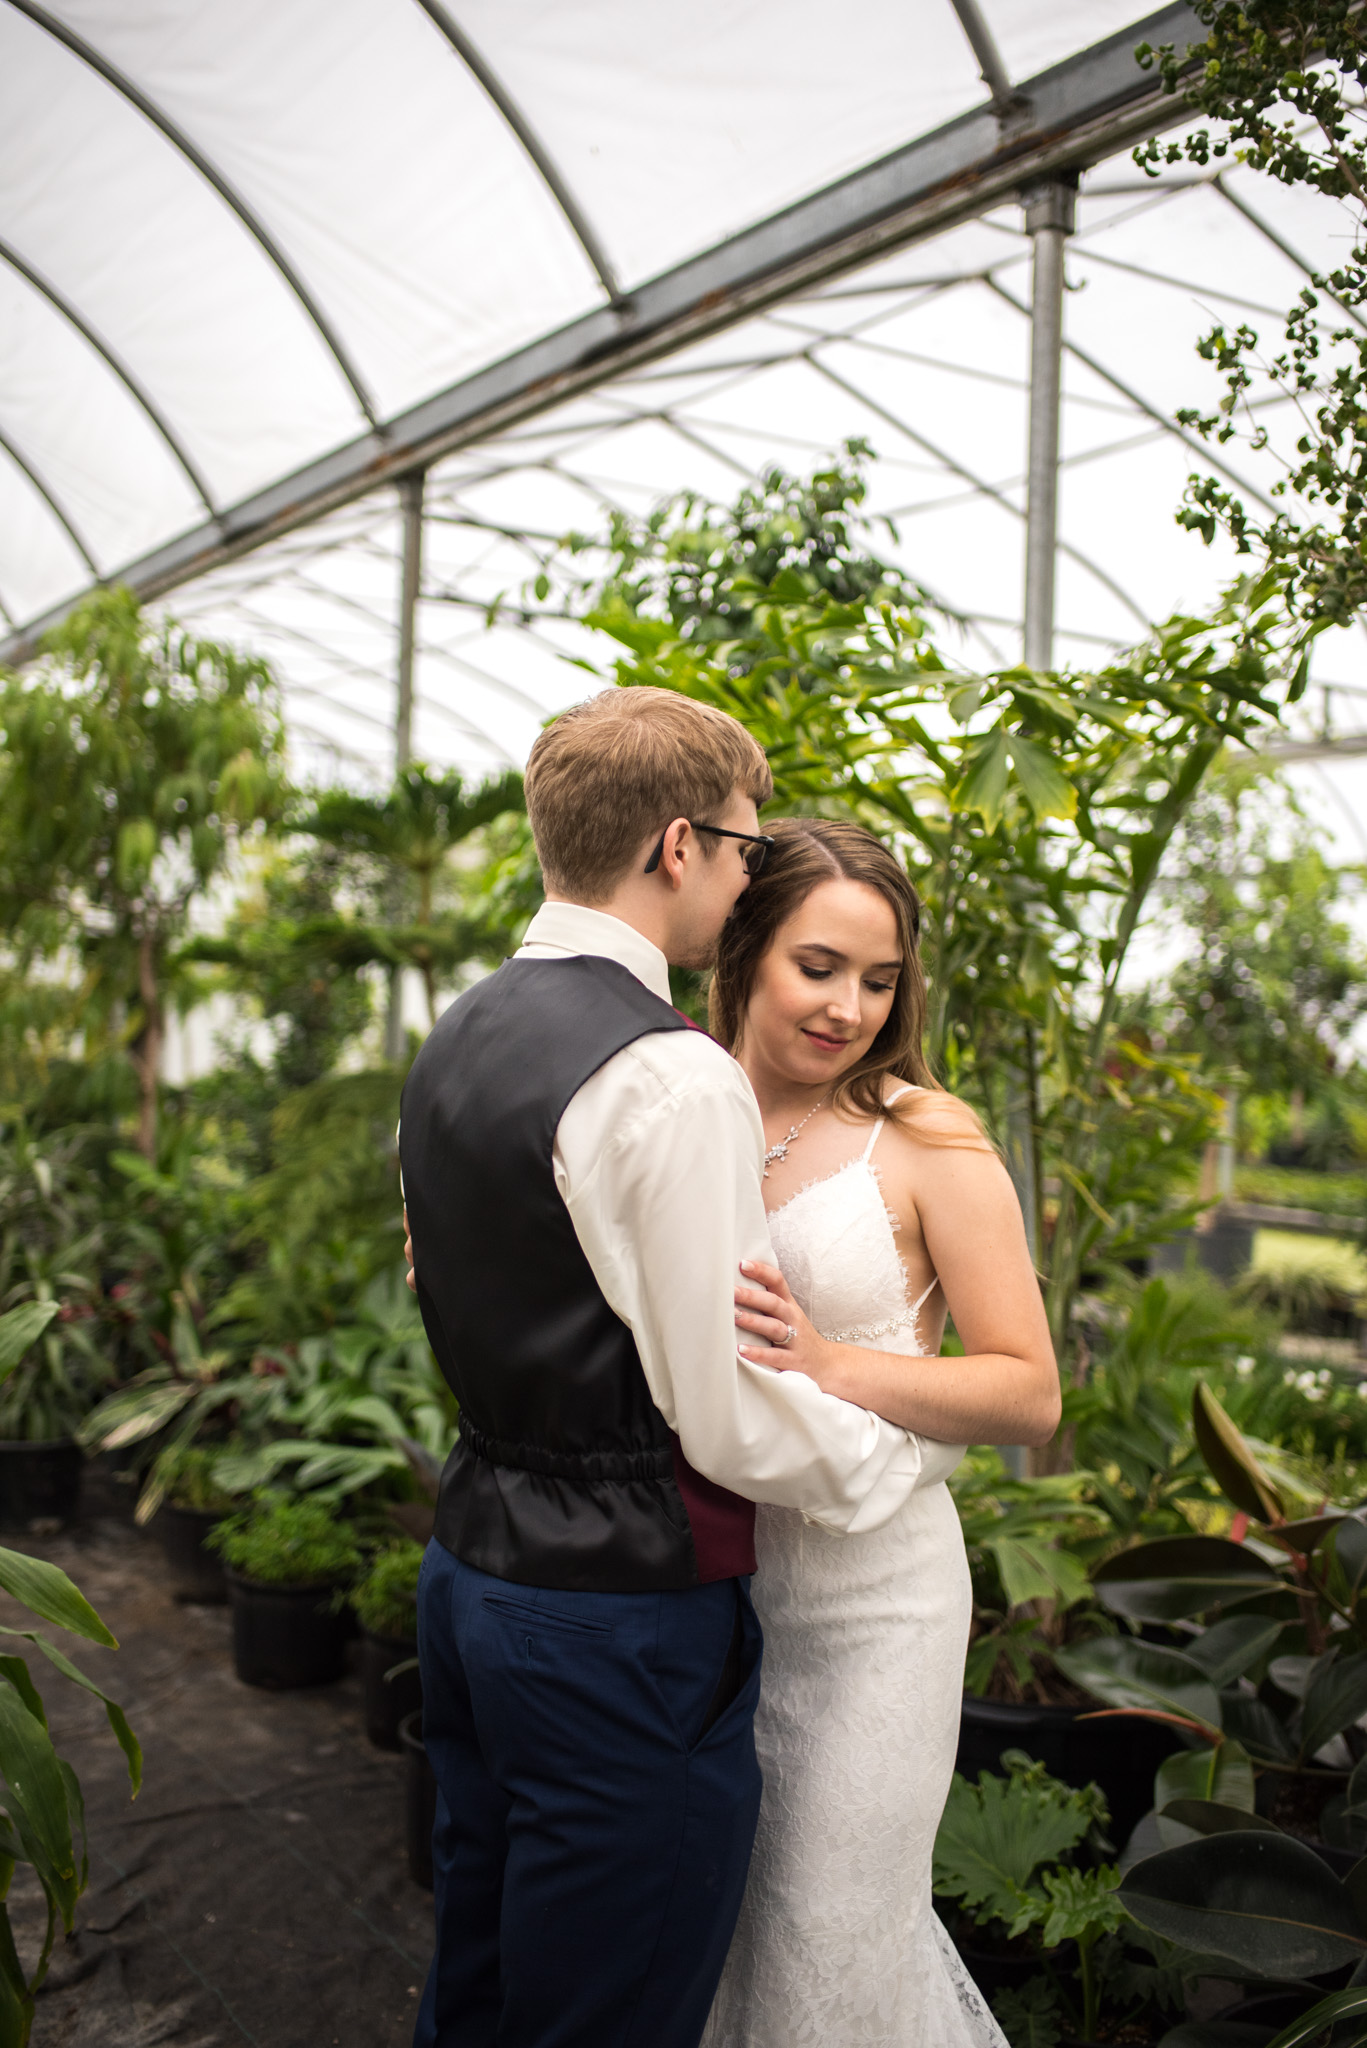 Abbotsford Wedding Photographer-66.jpg